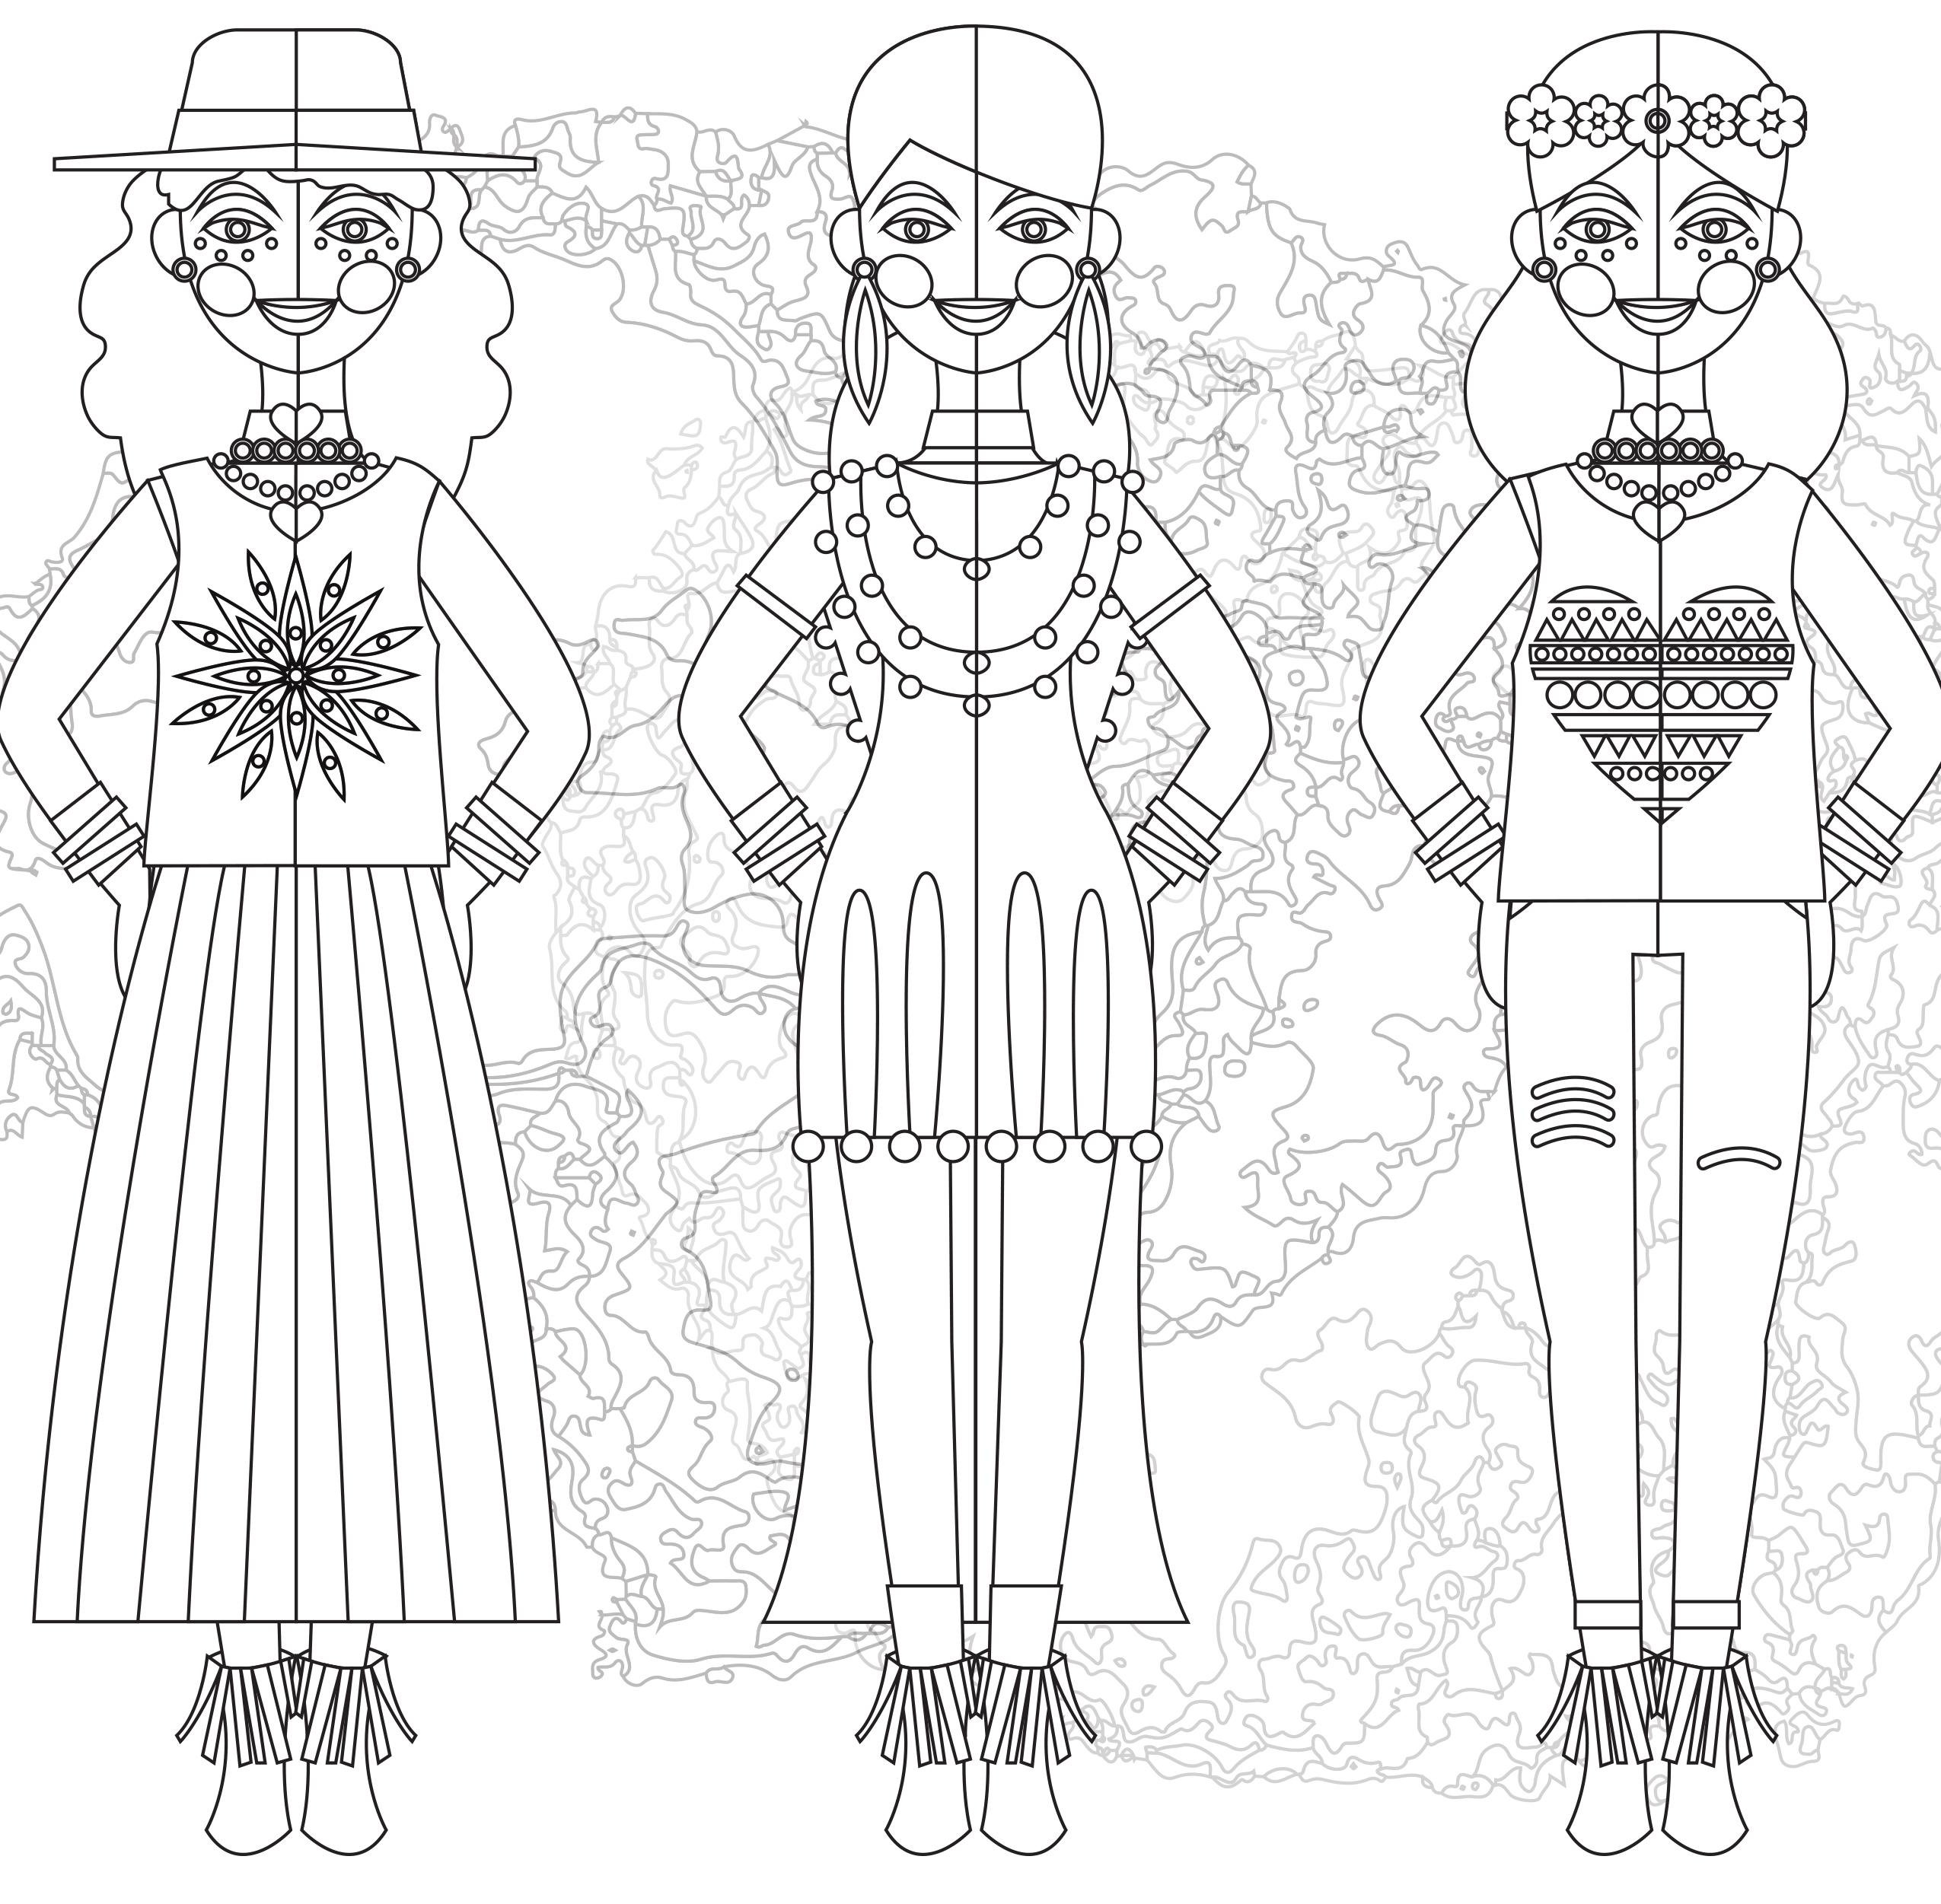 Journée internationale de la mode coloriage